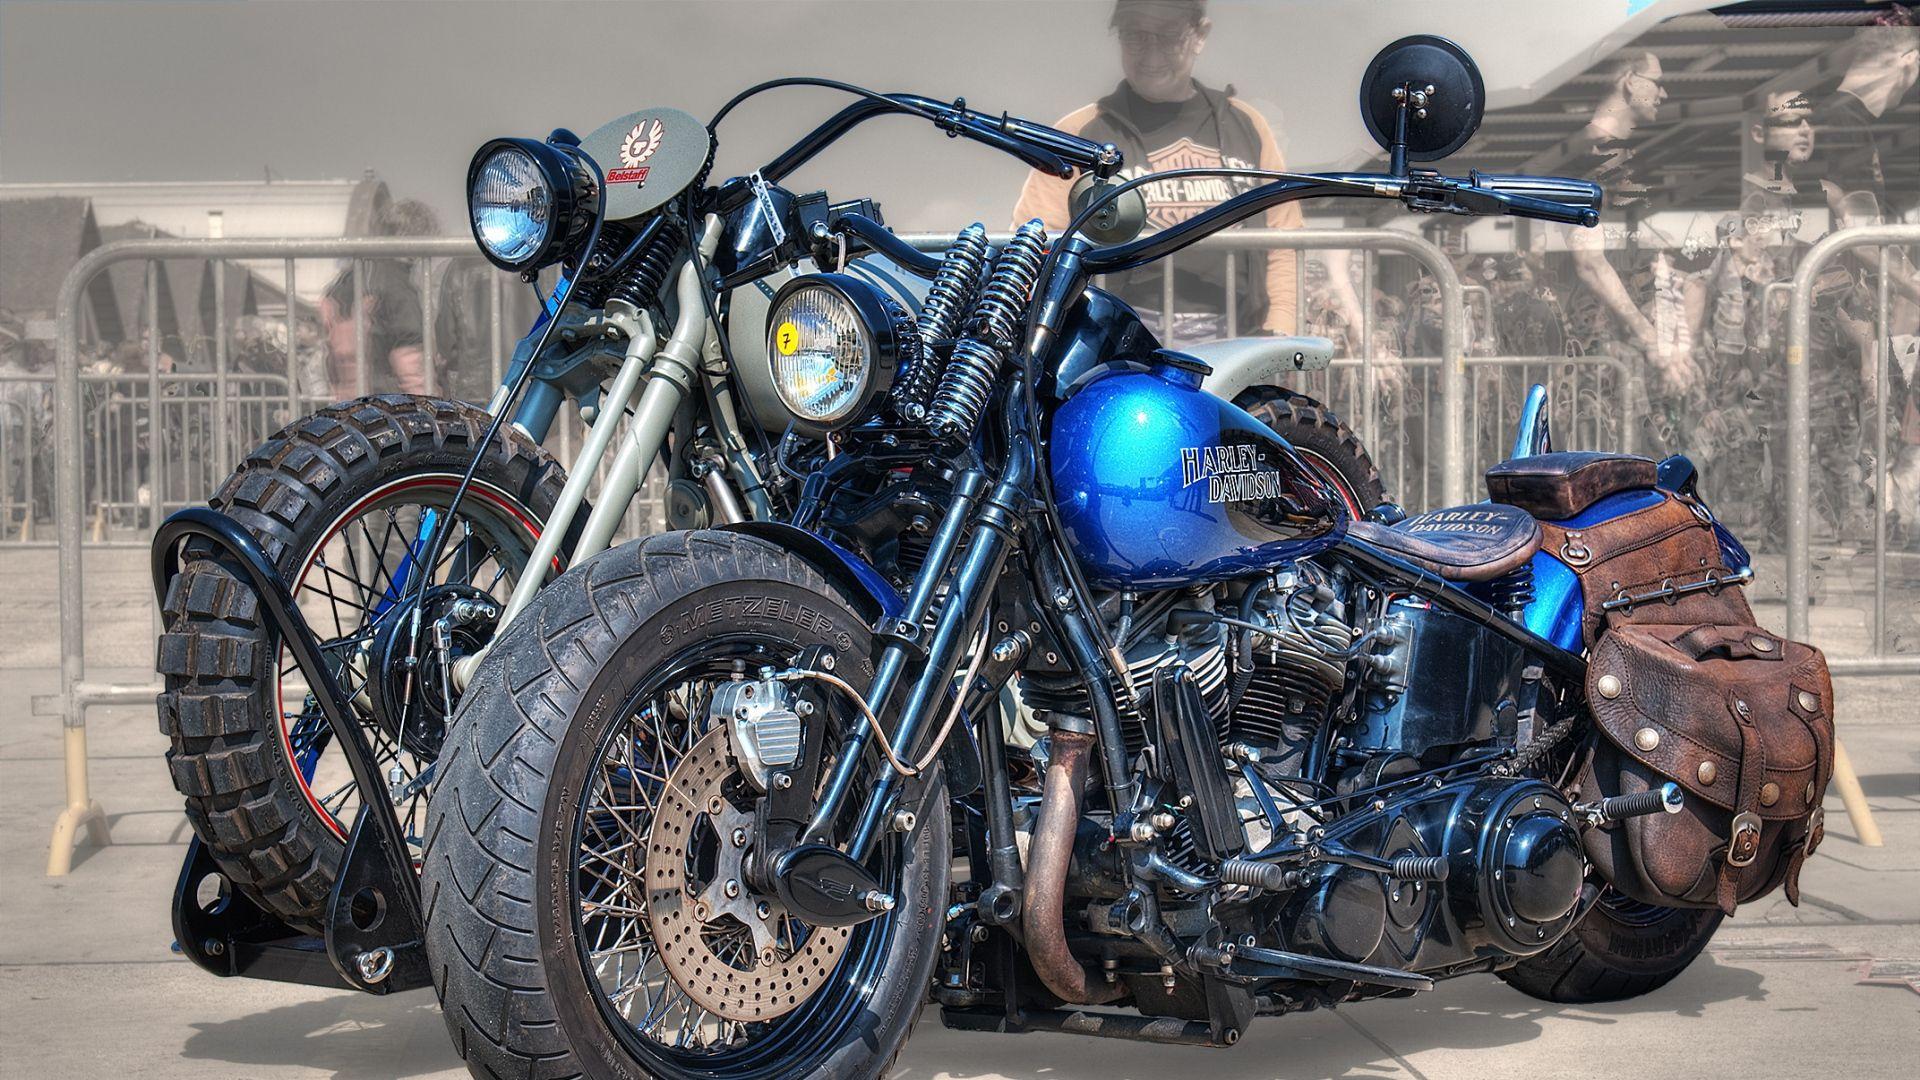 Full Hd Wallpaper Harley Davidson Motorcycle Brutal Desktop Motorcycle Wallpaper Harley Davidson Wallpaper Touring Motorcycles